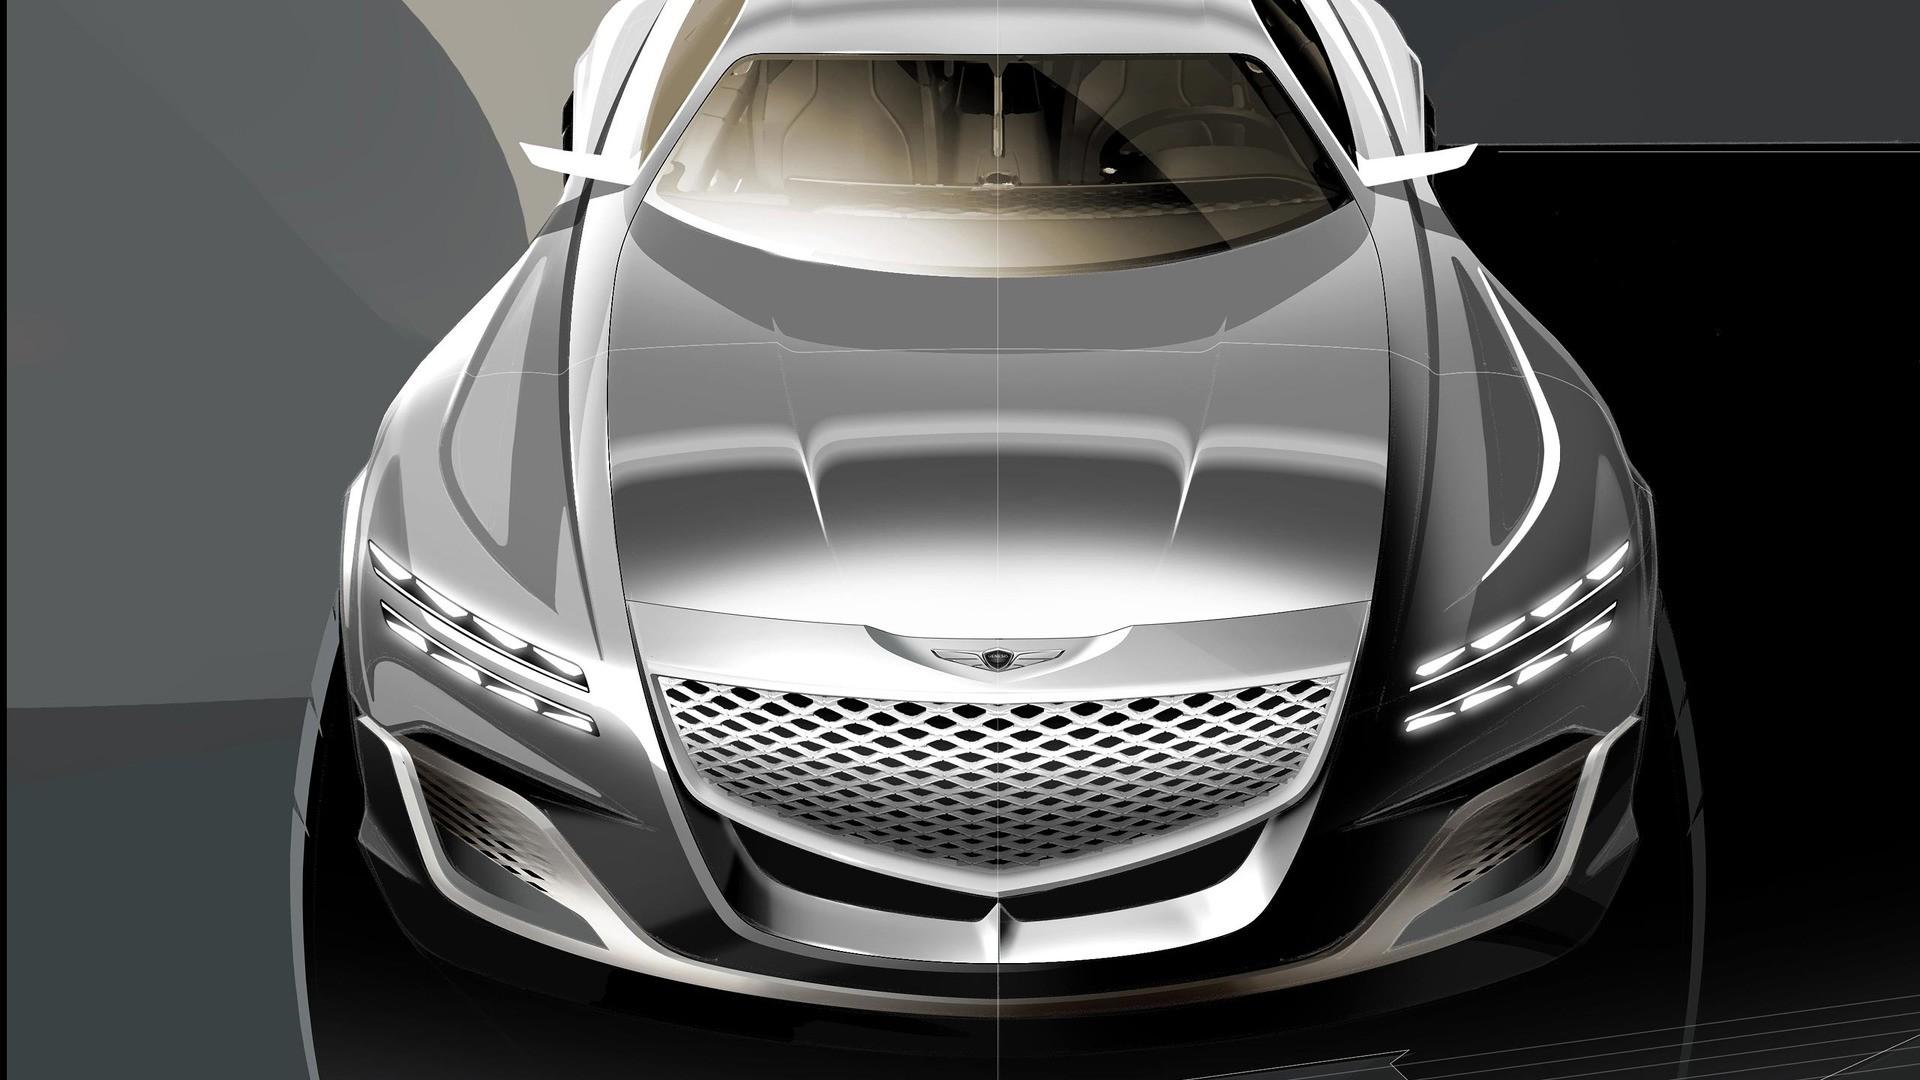 Santa Fe Suv >> Spyshots: 2020 Genesis GV80 SUV Testing to Kickstart Hyundai's Luxury Crossover - autoevolution